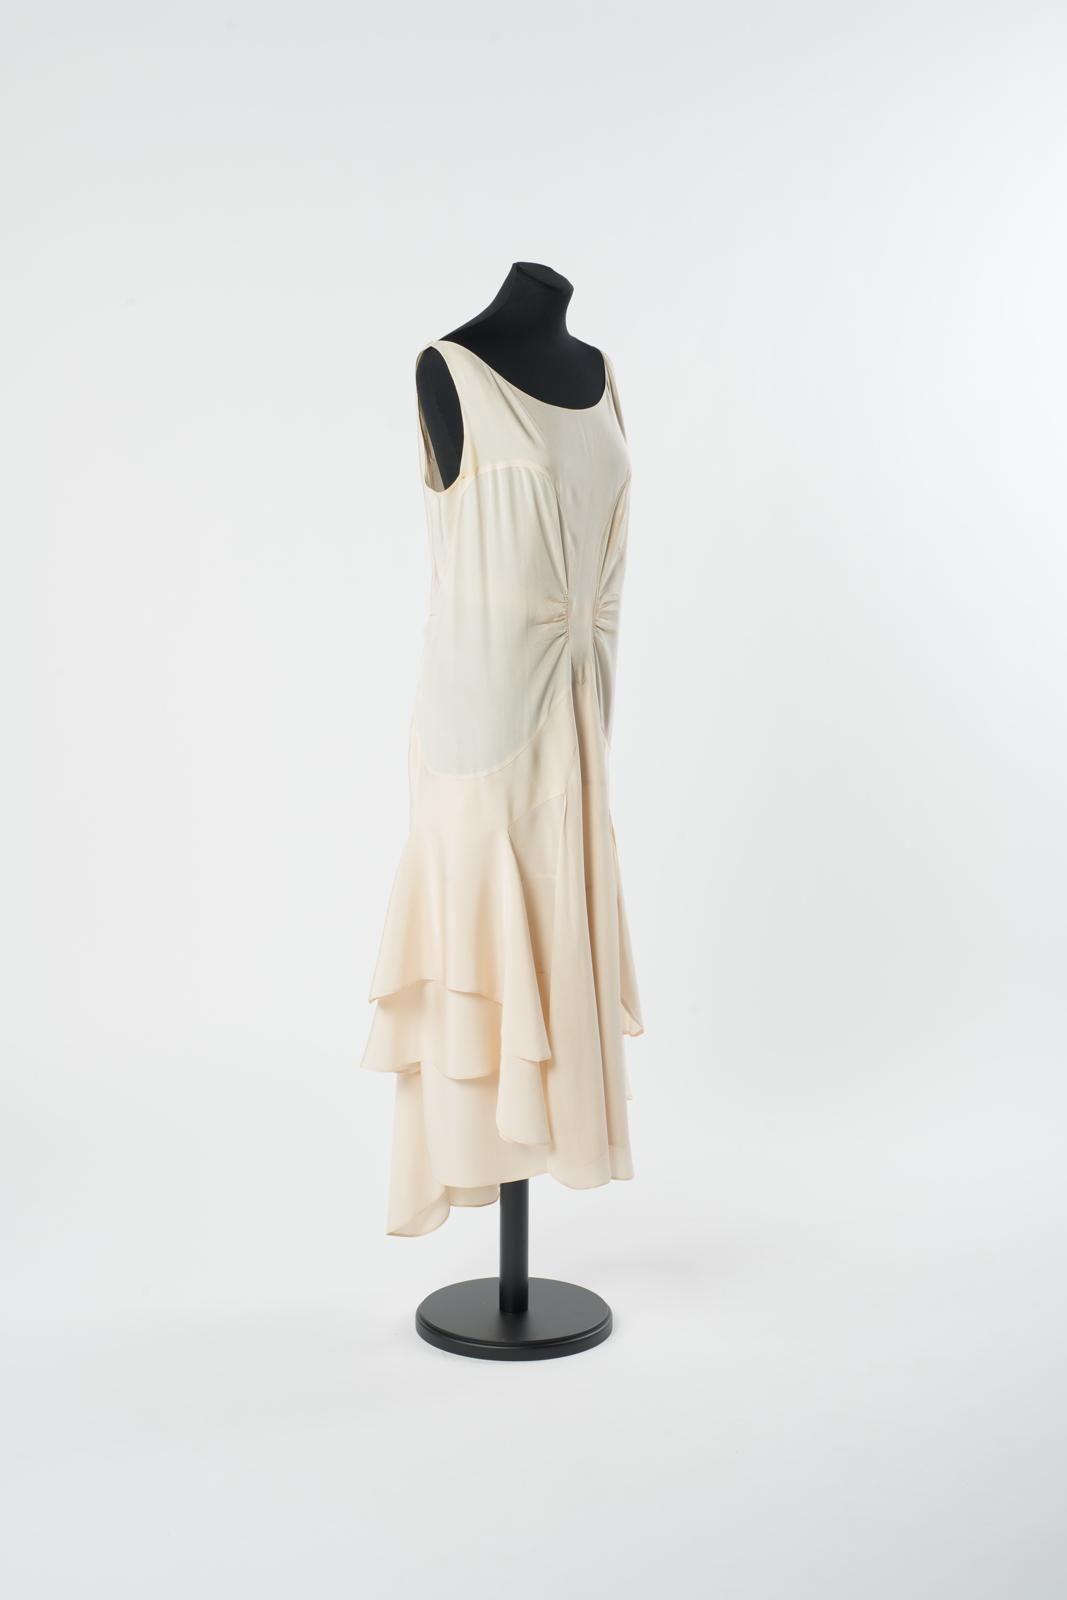 abendkleid um 1930 viskose (krepp) | abendkleid, kleider